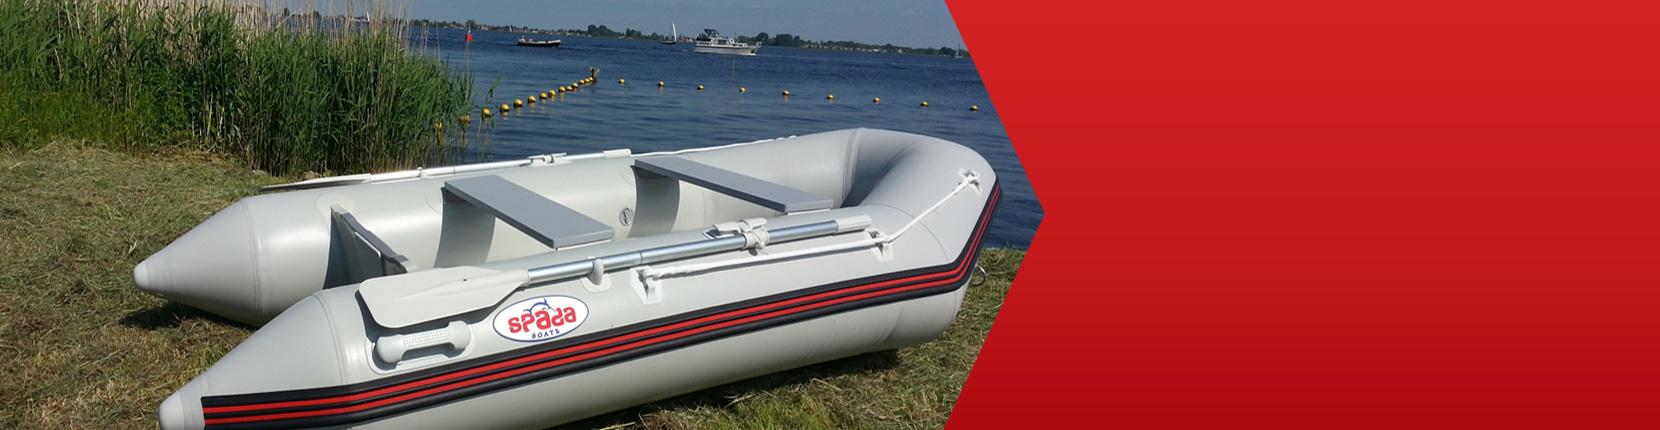 slider-spadaboats-empty